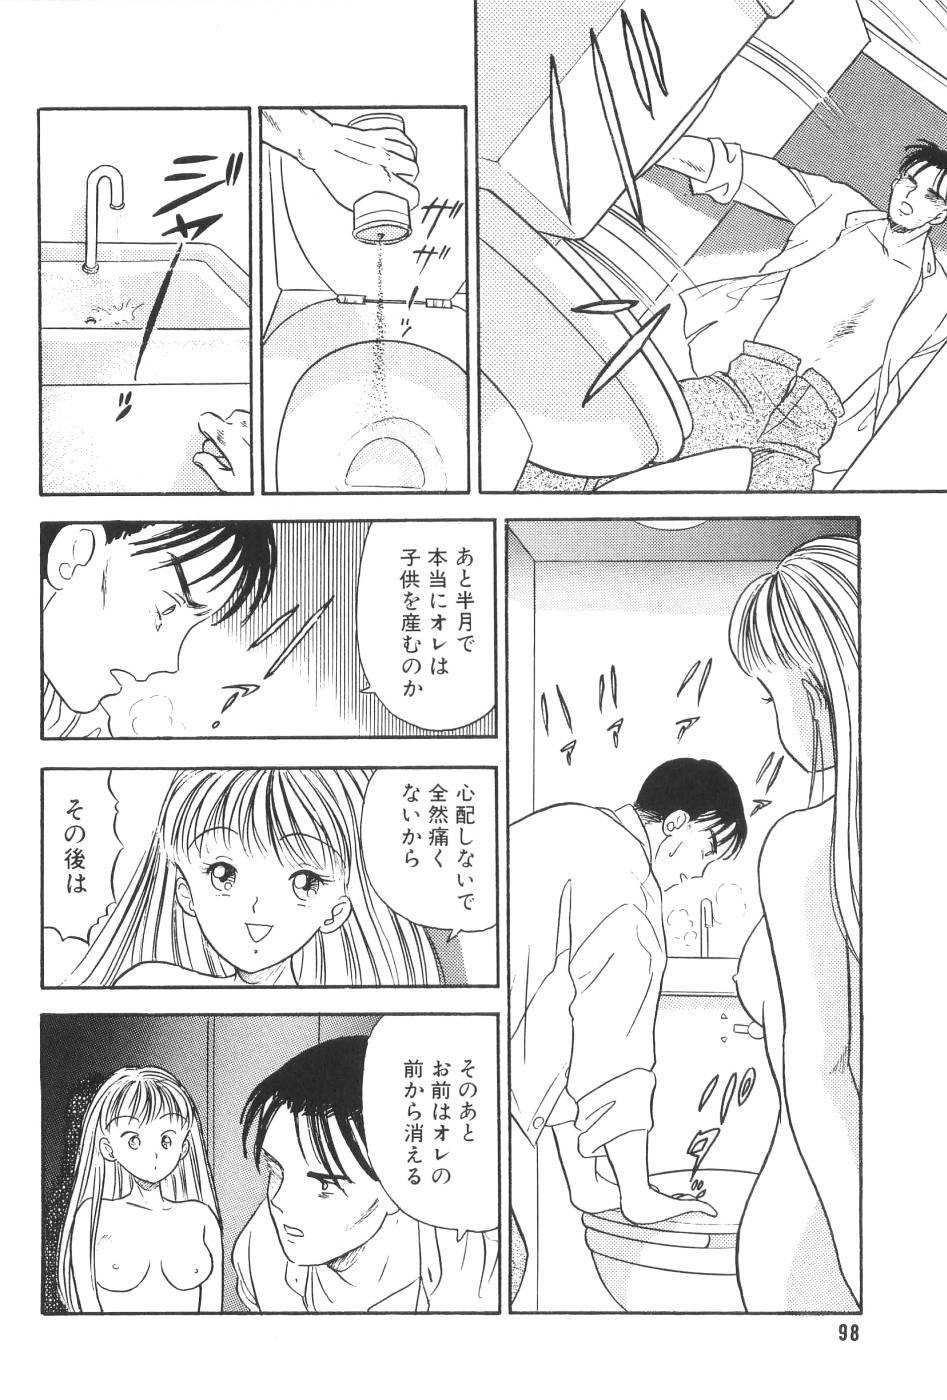 Namioto Densetsu 99